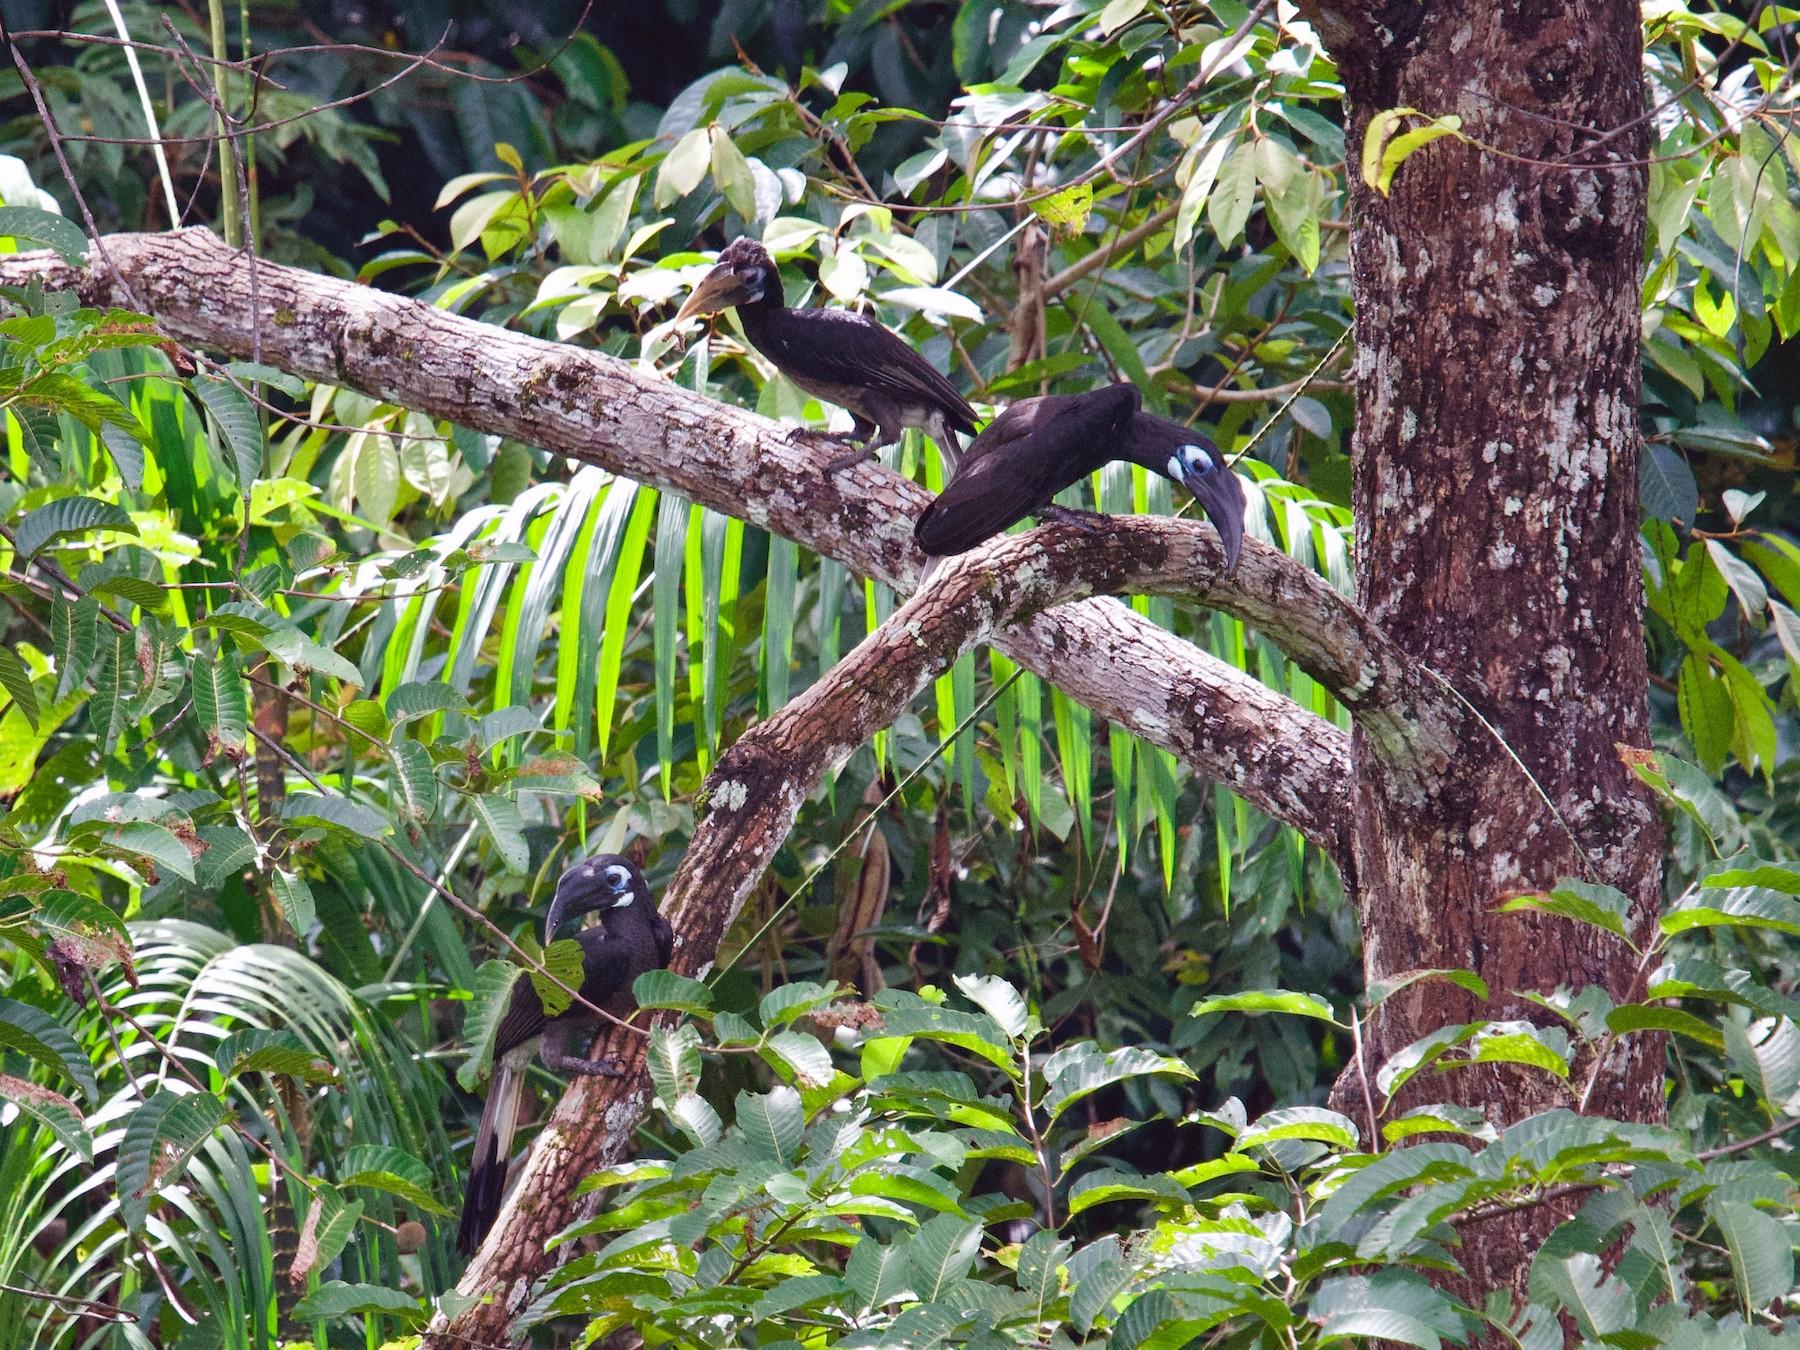 Bushy-crested Hornbill - Qin Huang